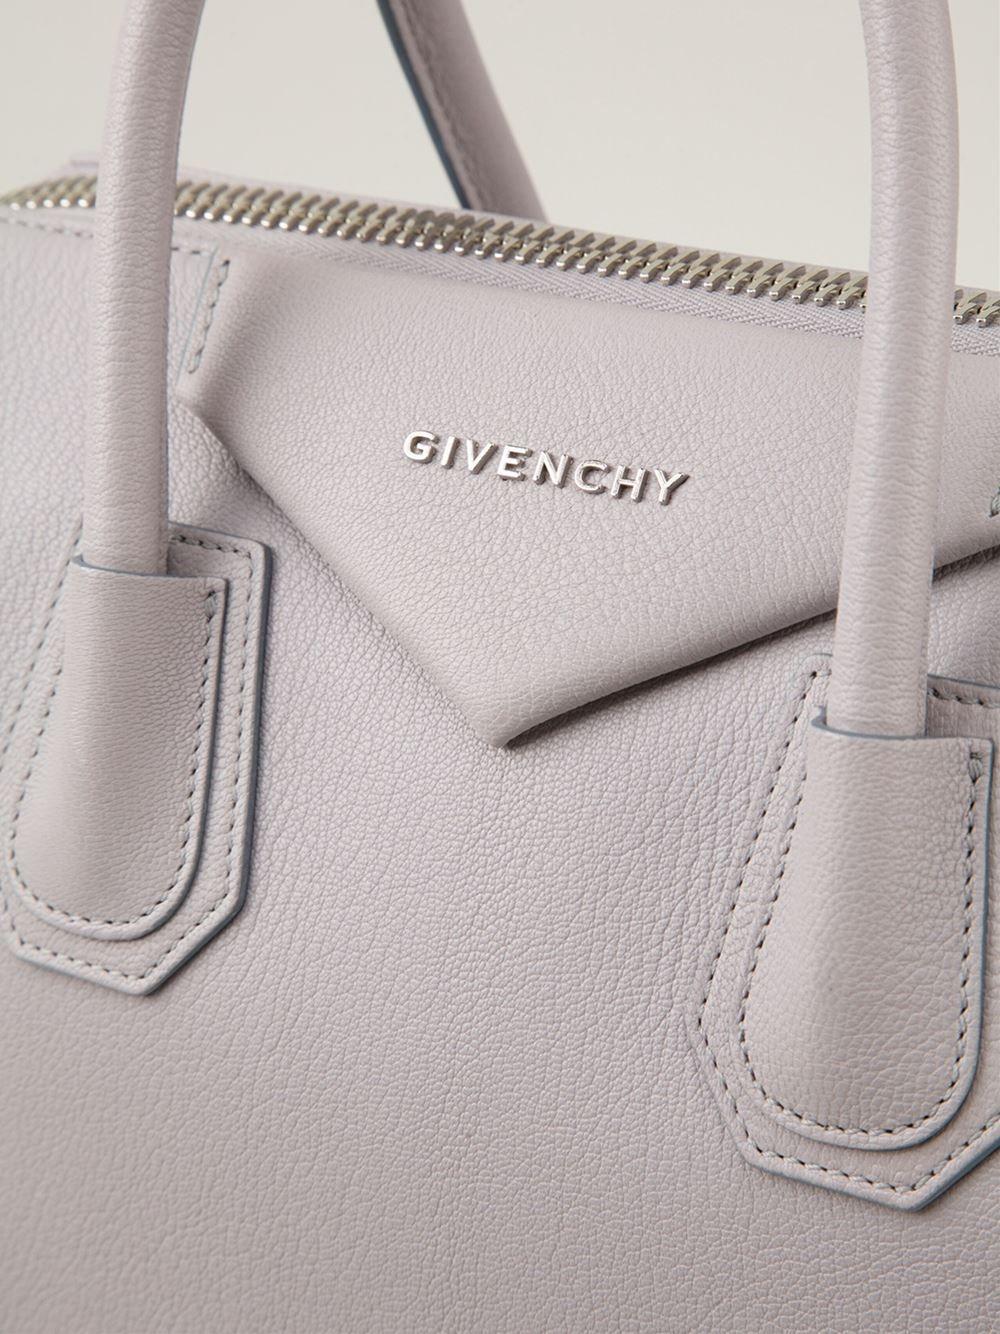 Givenchy Medium Antigona Tote Farfetch Givenchy Givenchy Antigona Tote